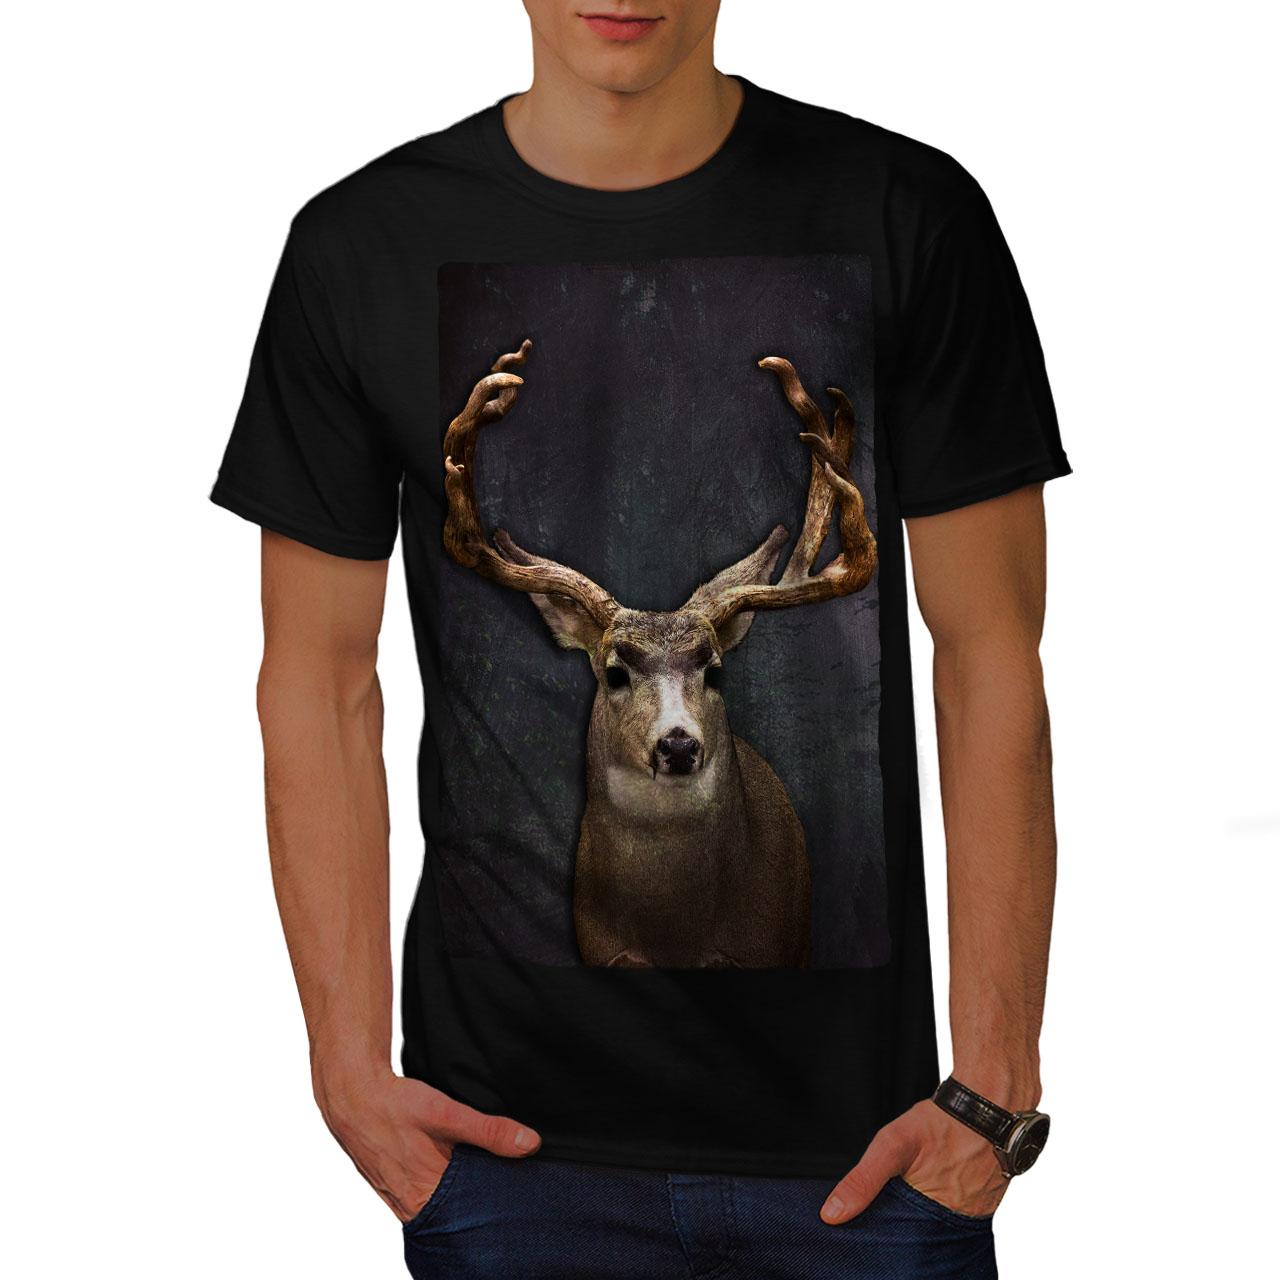 Wellcoda BESTIA Cervo Animale Selvatico Da Uomo T-shirt Buck design grafico stampato T-shirt